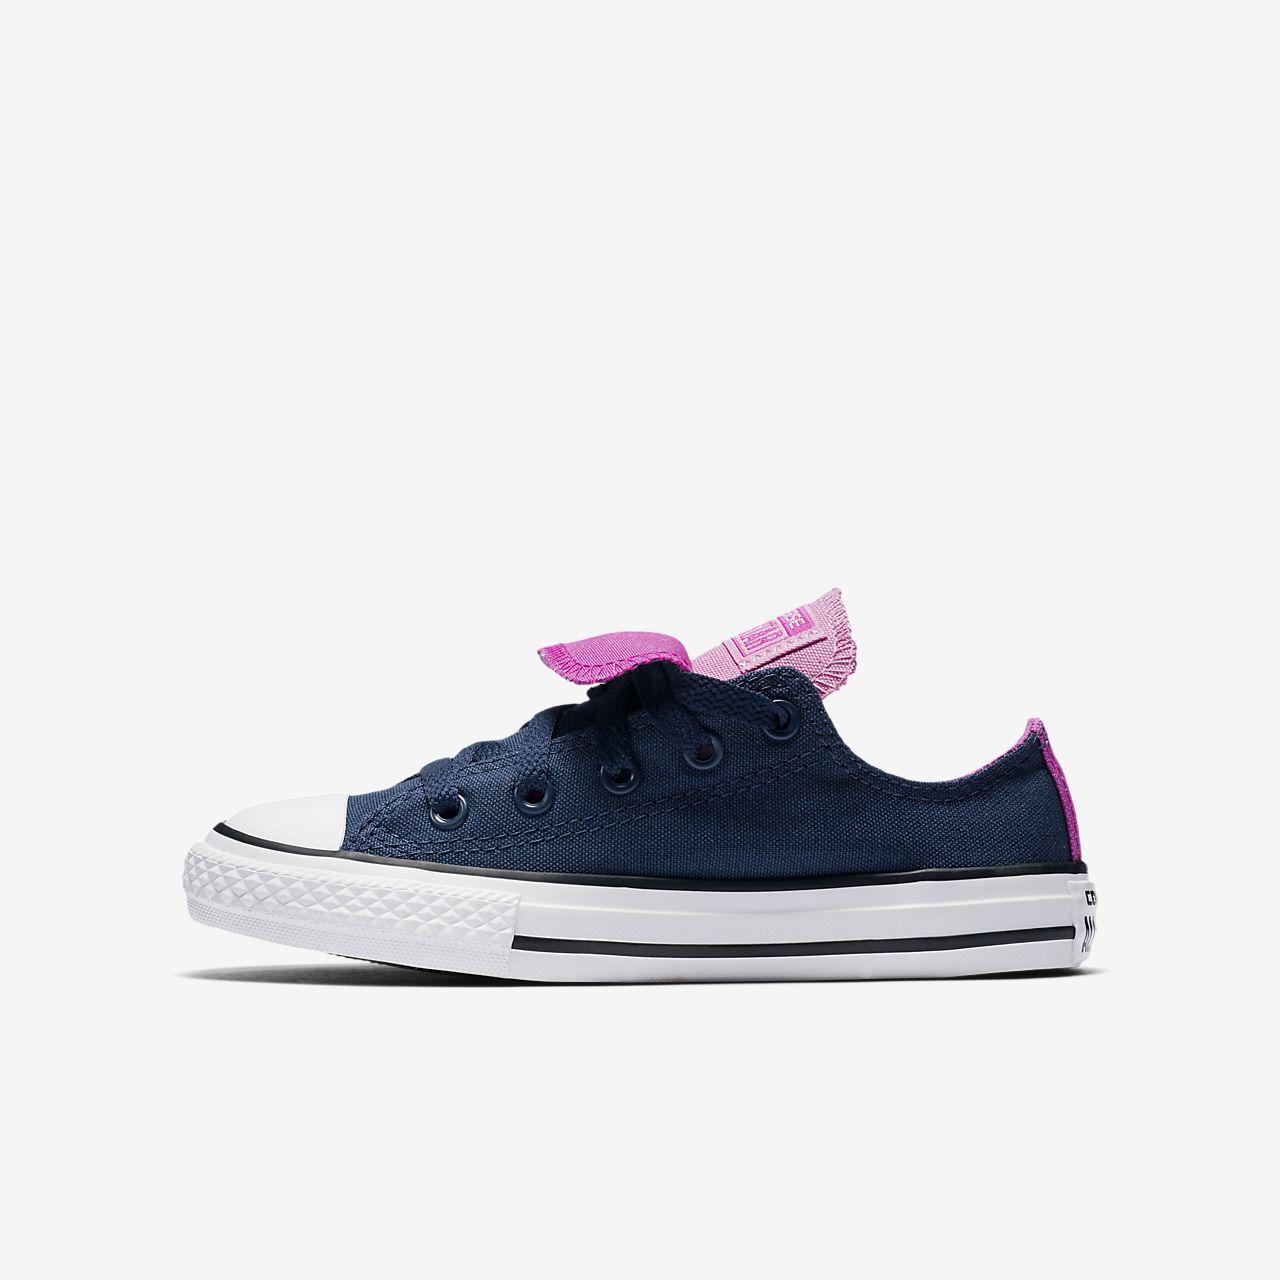 Converse Chuck Taylor All Star Double Tongue Little/Big Kids' Shoe